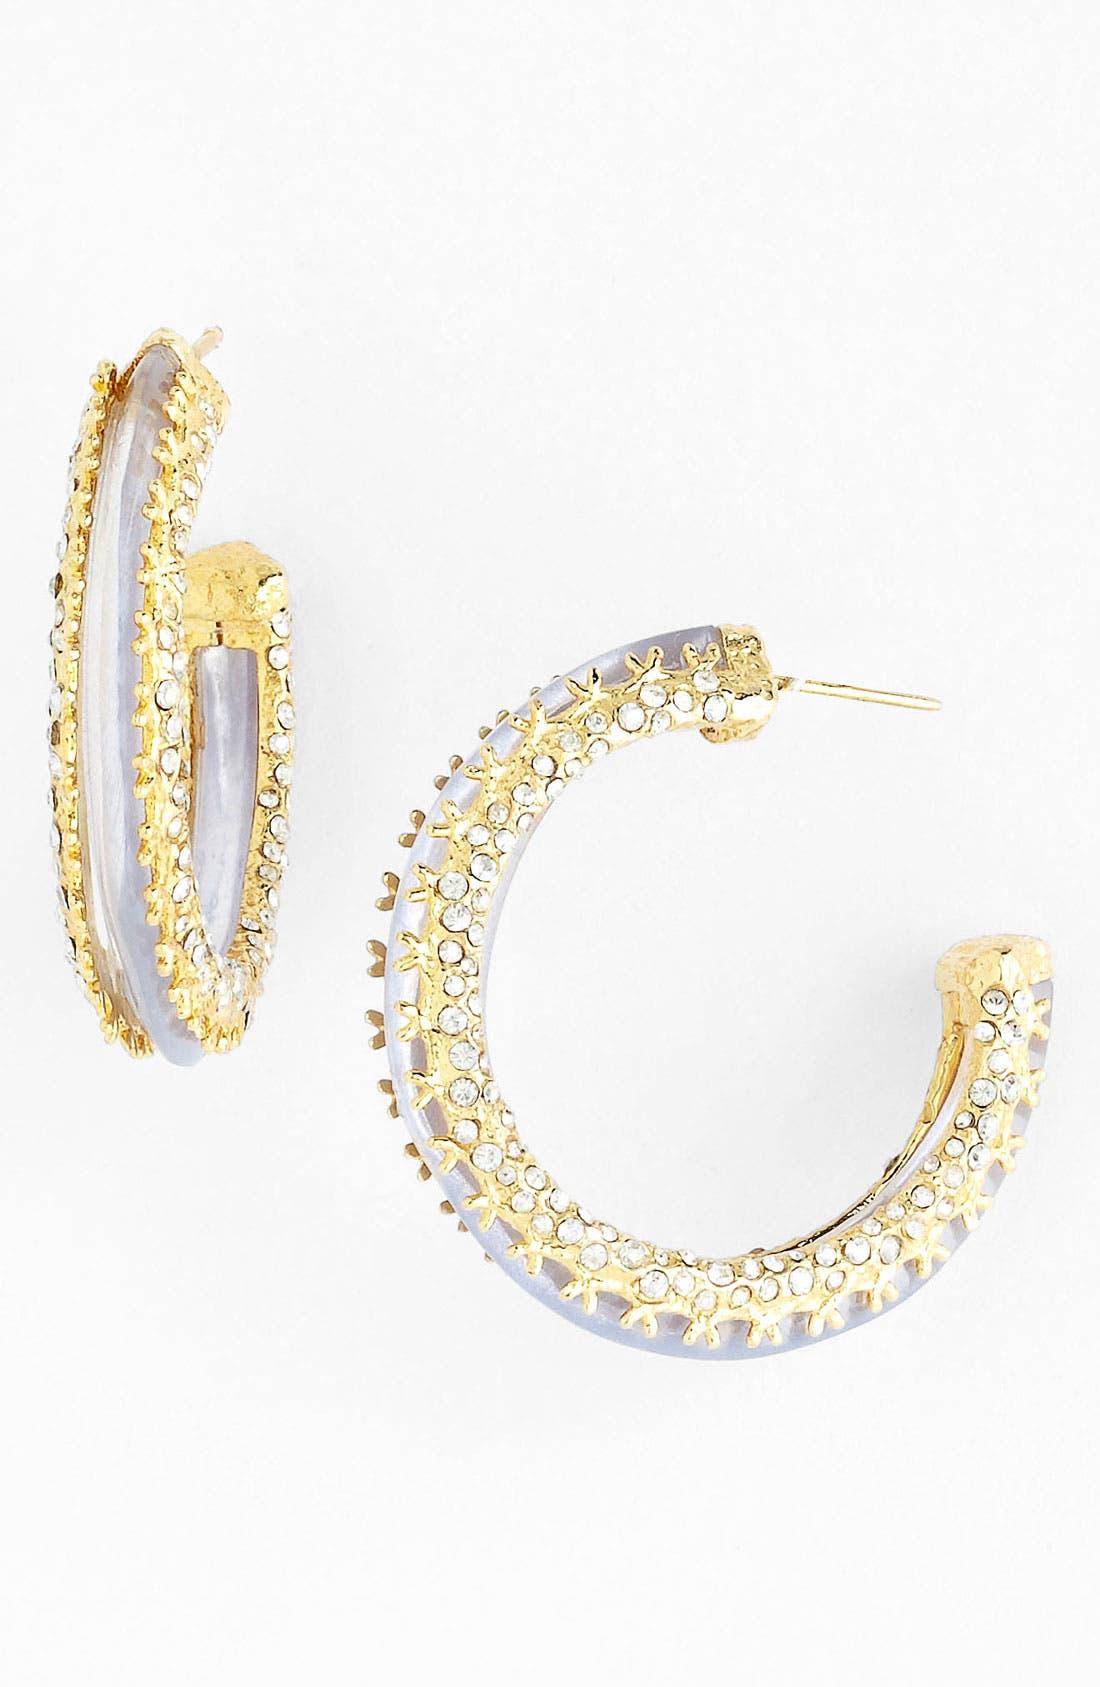 Main Image - Alexis Bittar 'Elements - Siyabona' Hoop Earrings